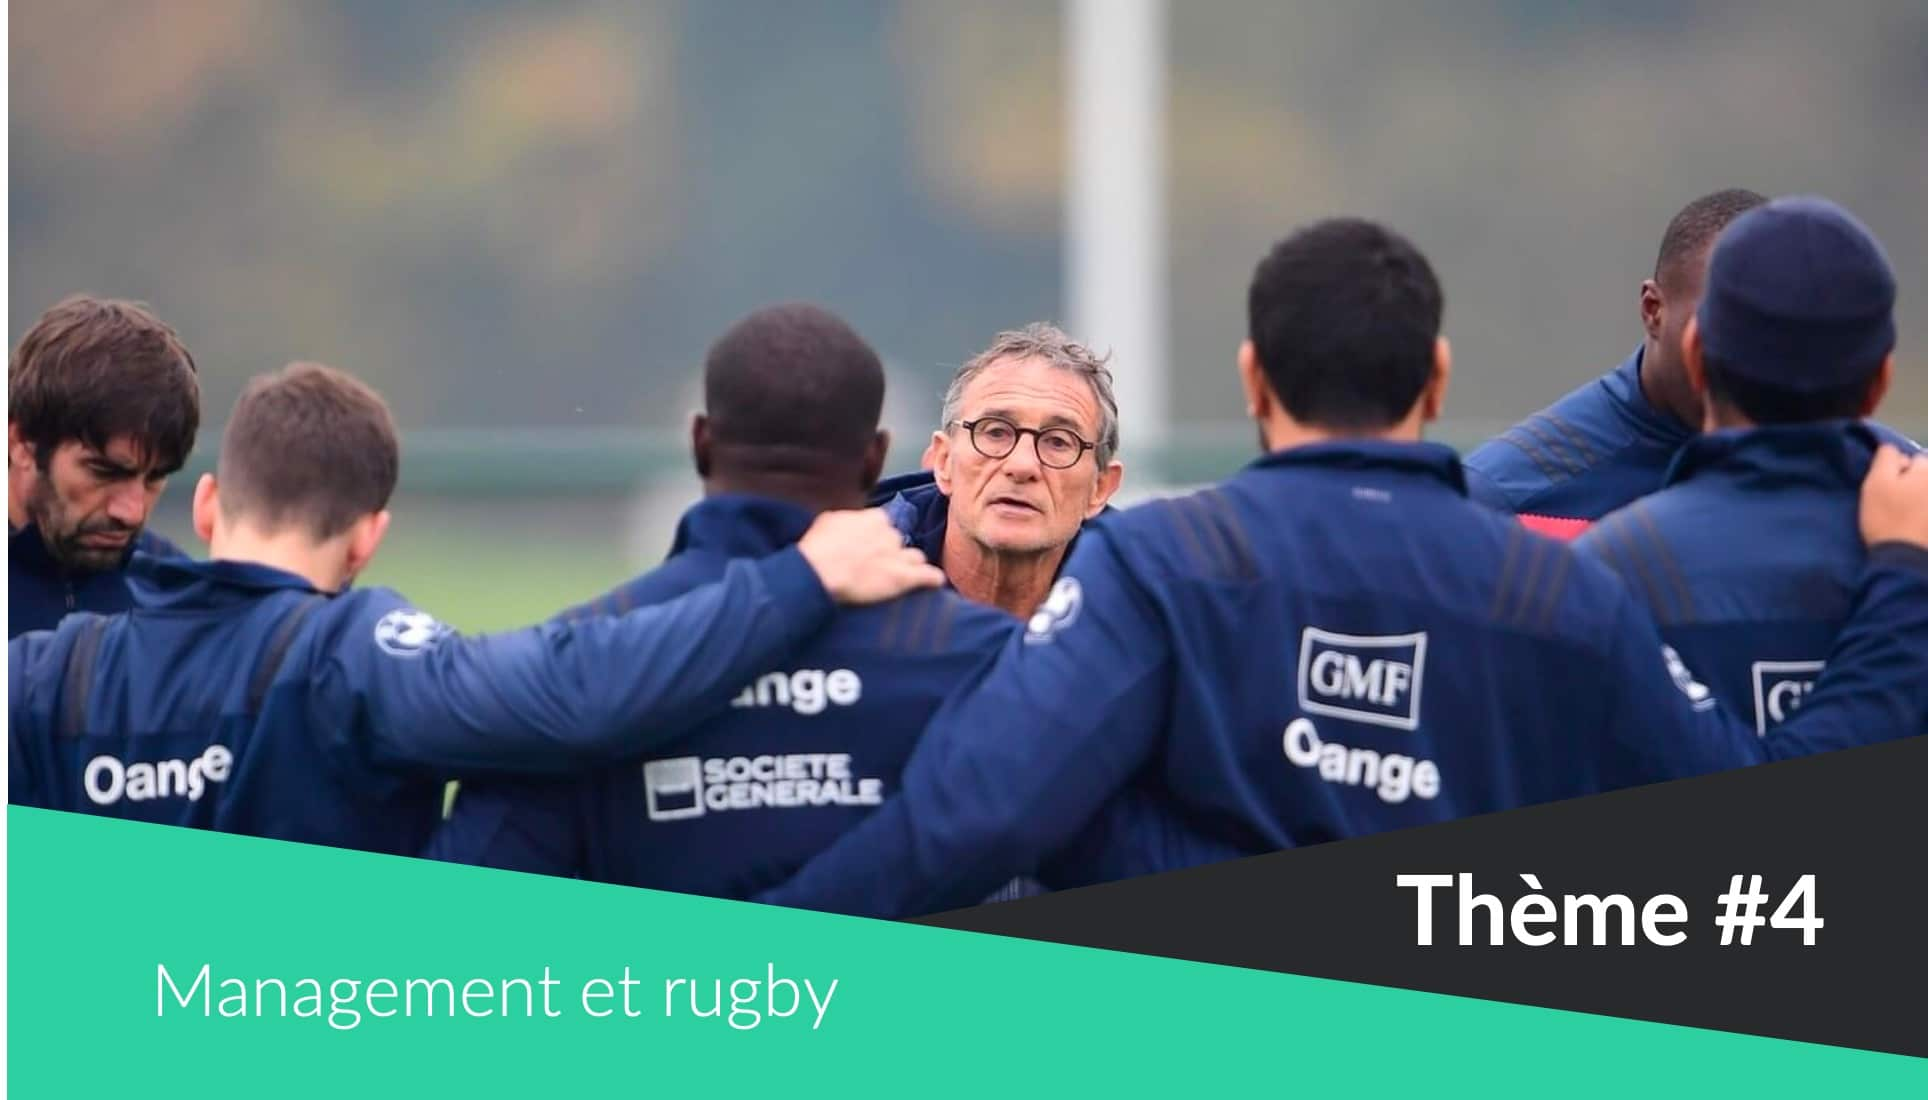 Thème - Management du rugby